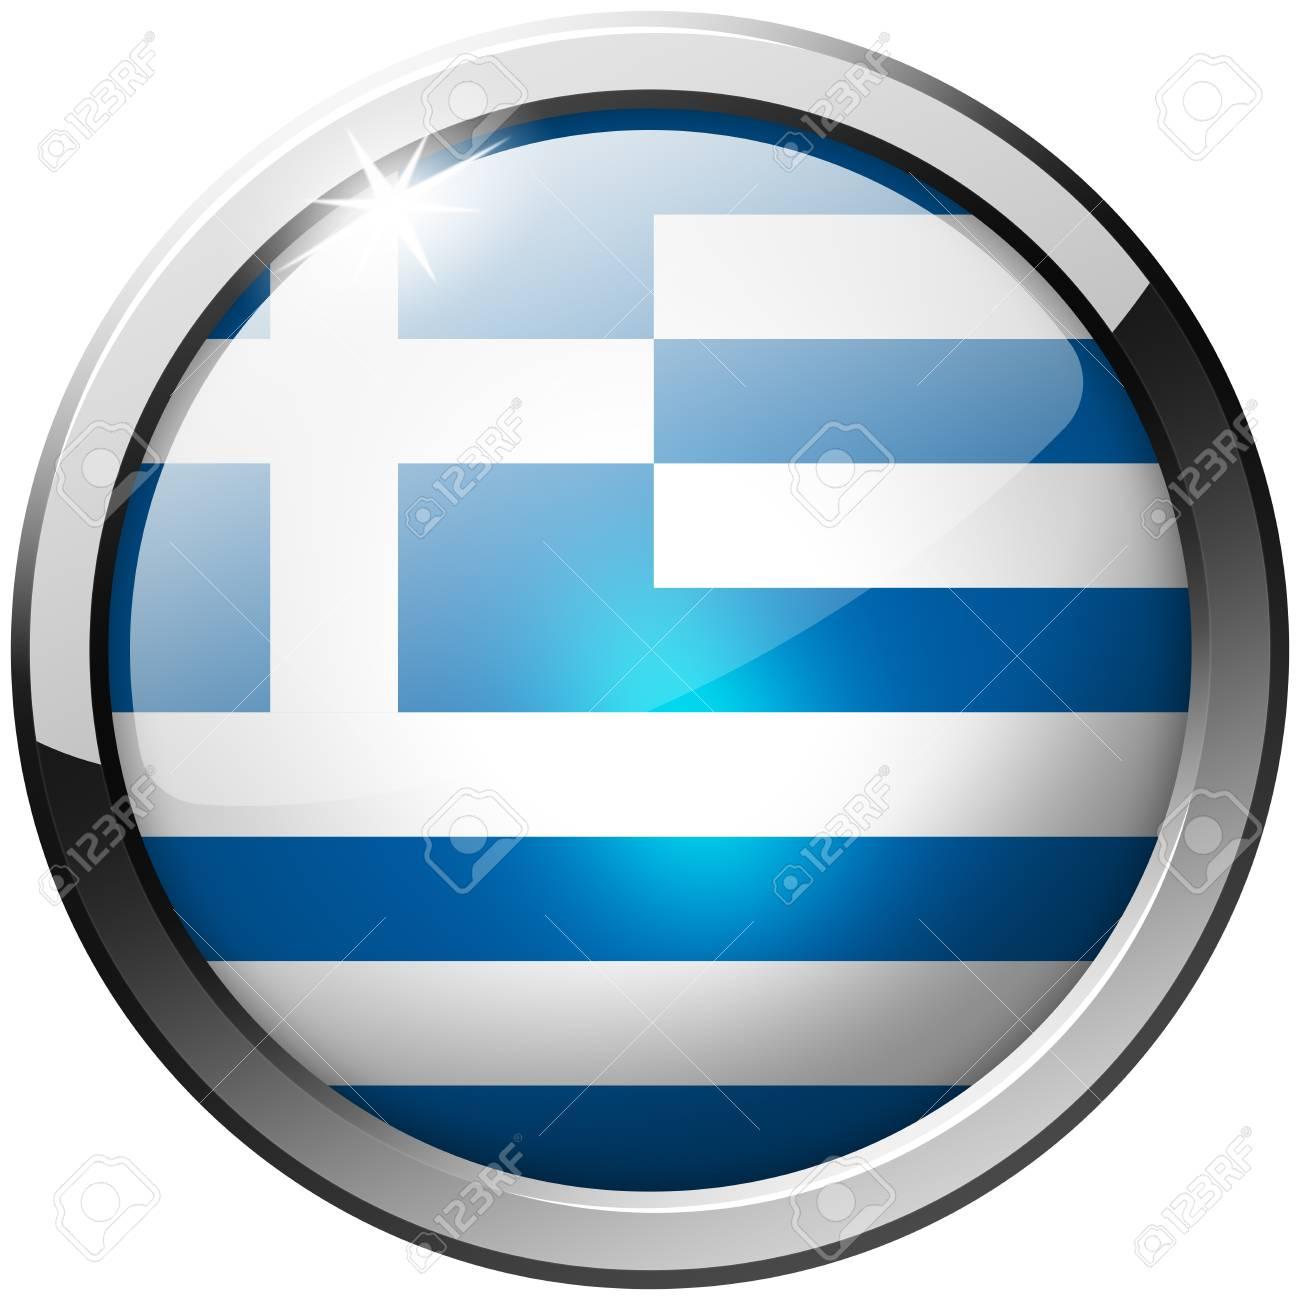 Greece Round Metal Glass Button Stock Photo - 21200756